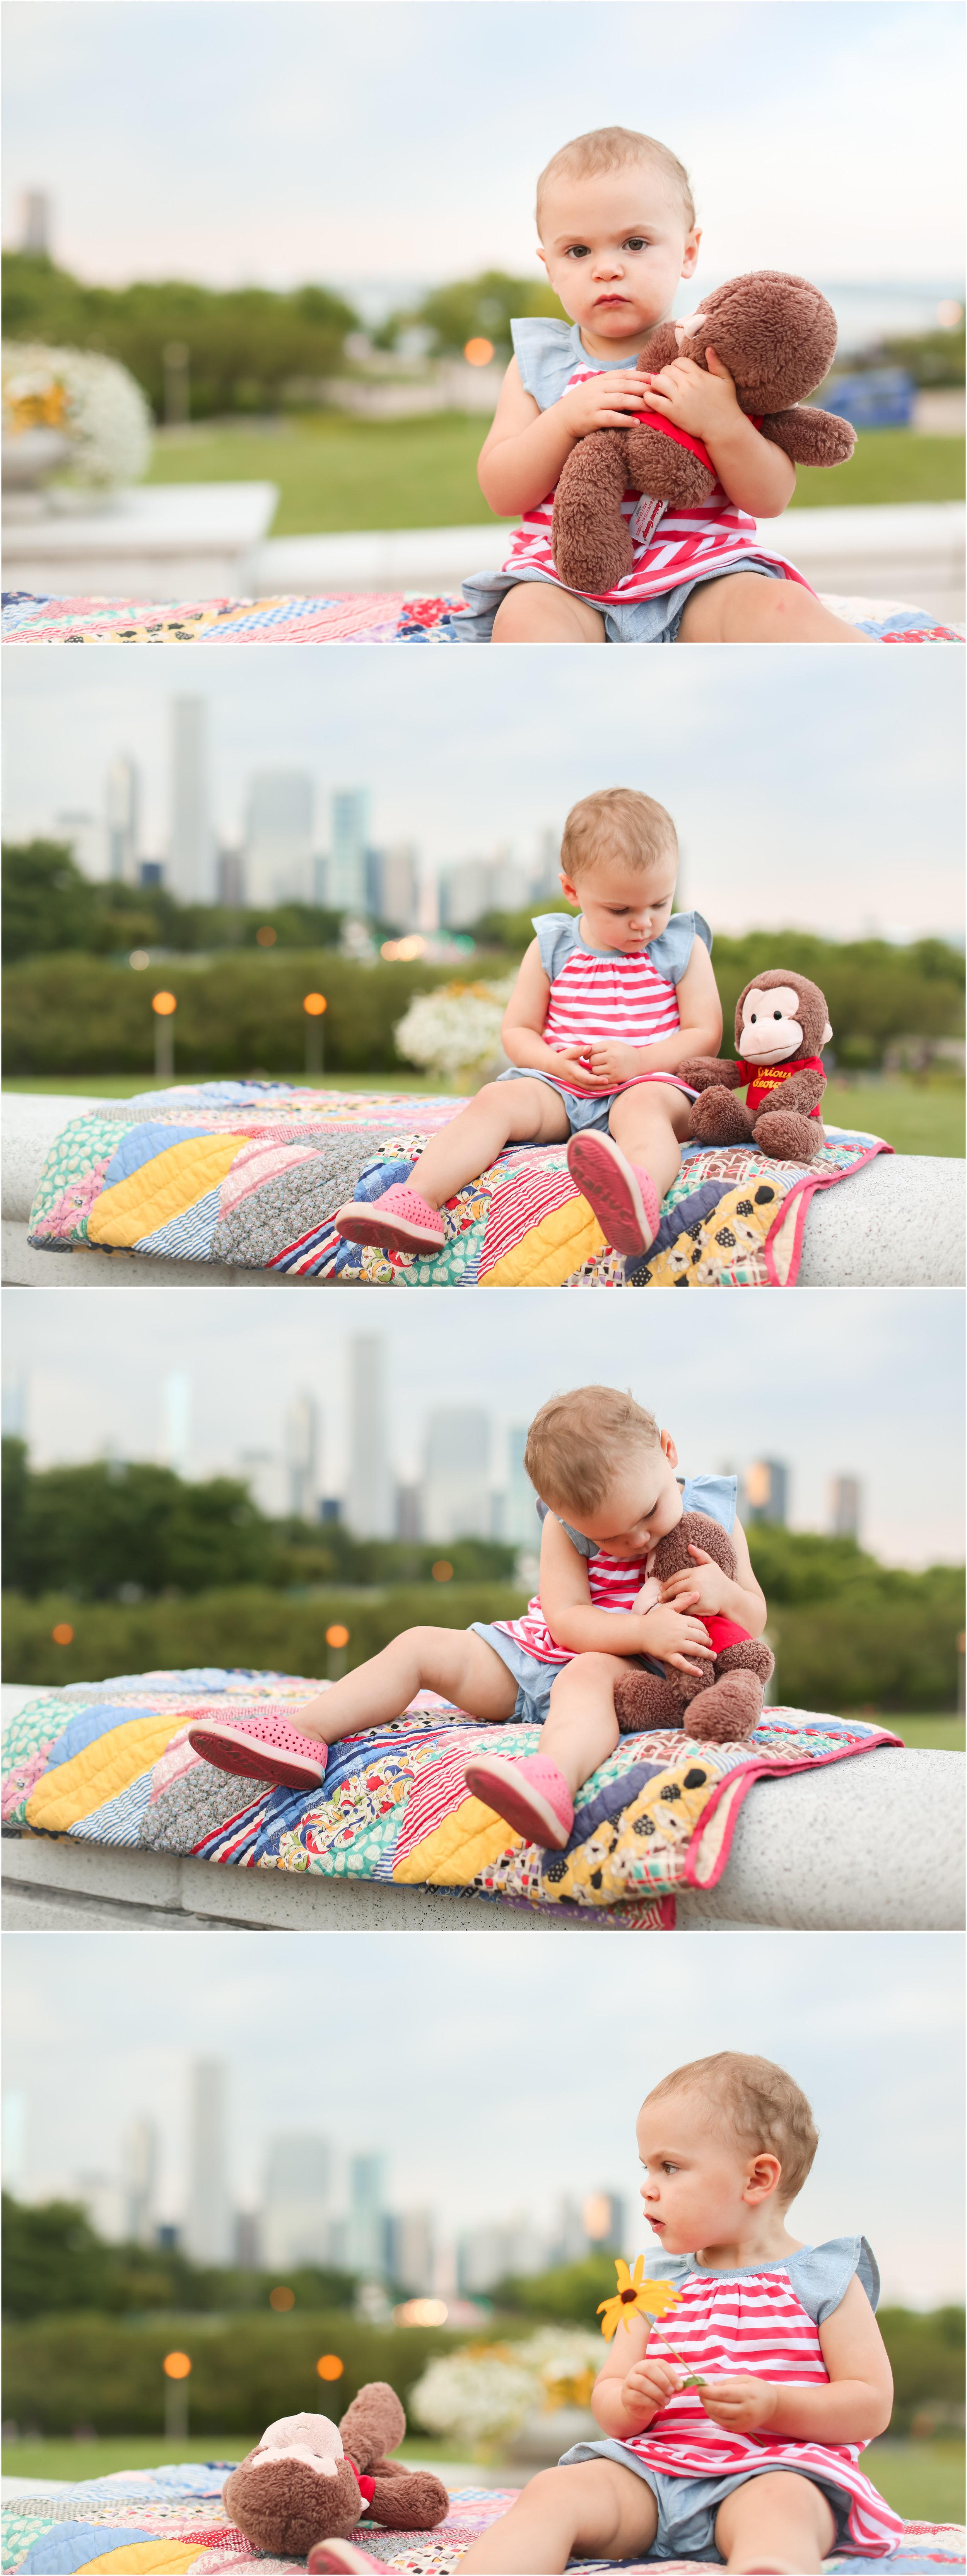 jenny grimm chicago child lifestyle photographer